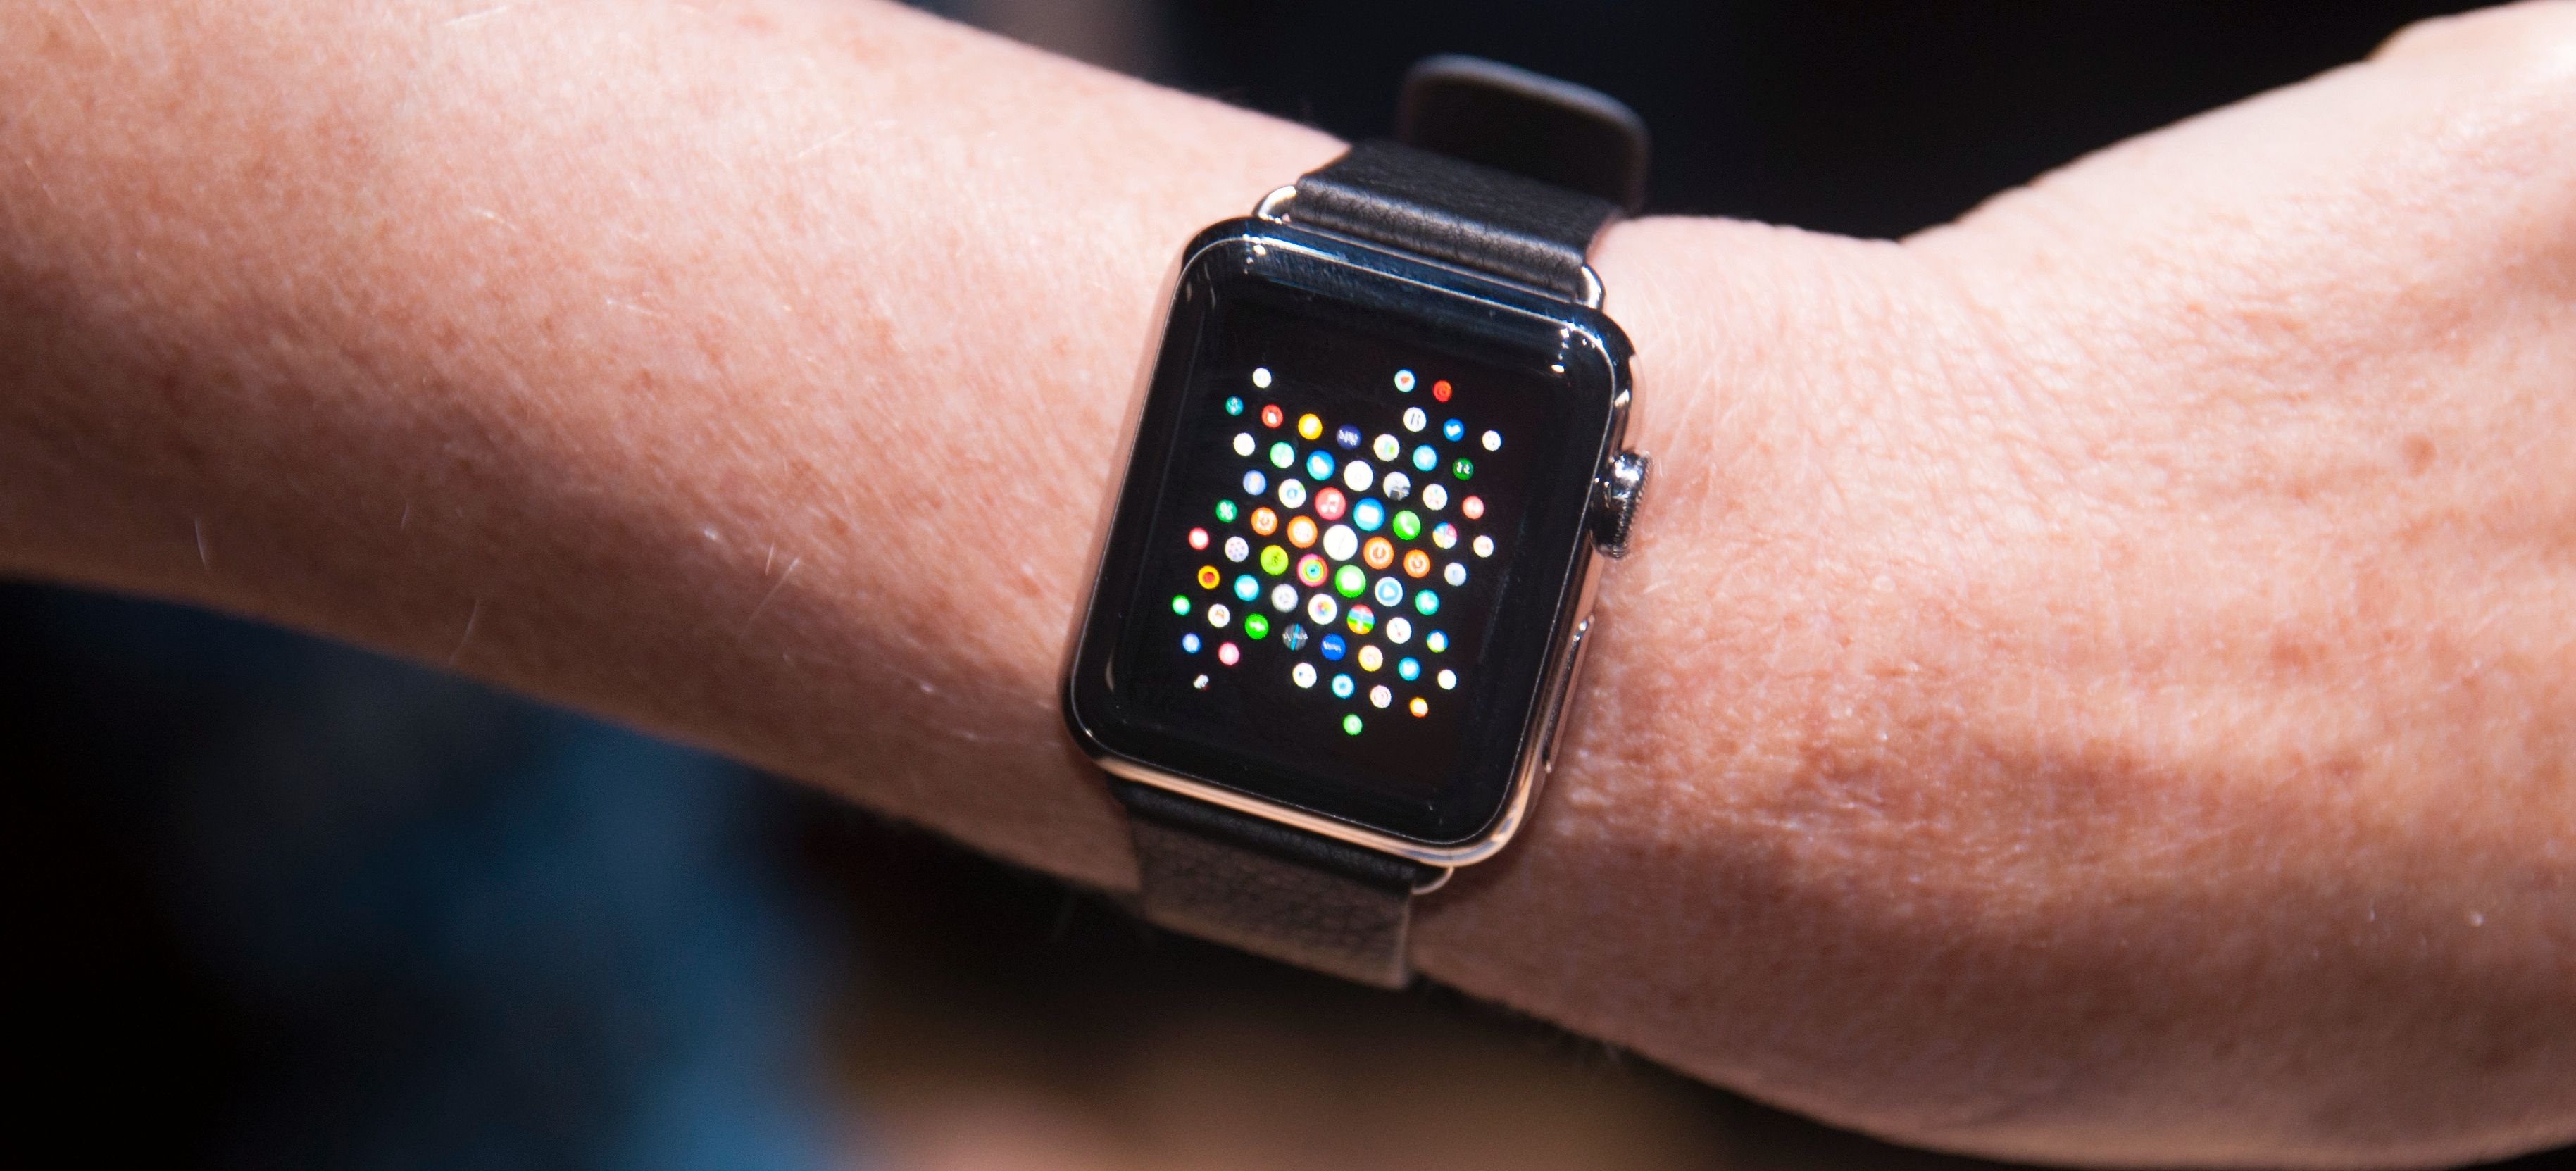 MANGE MODELLER: Apple vil ikke at det skal være